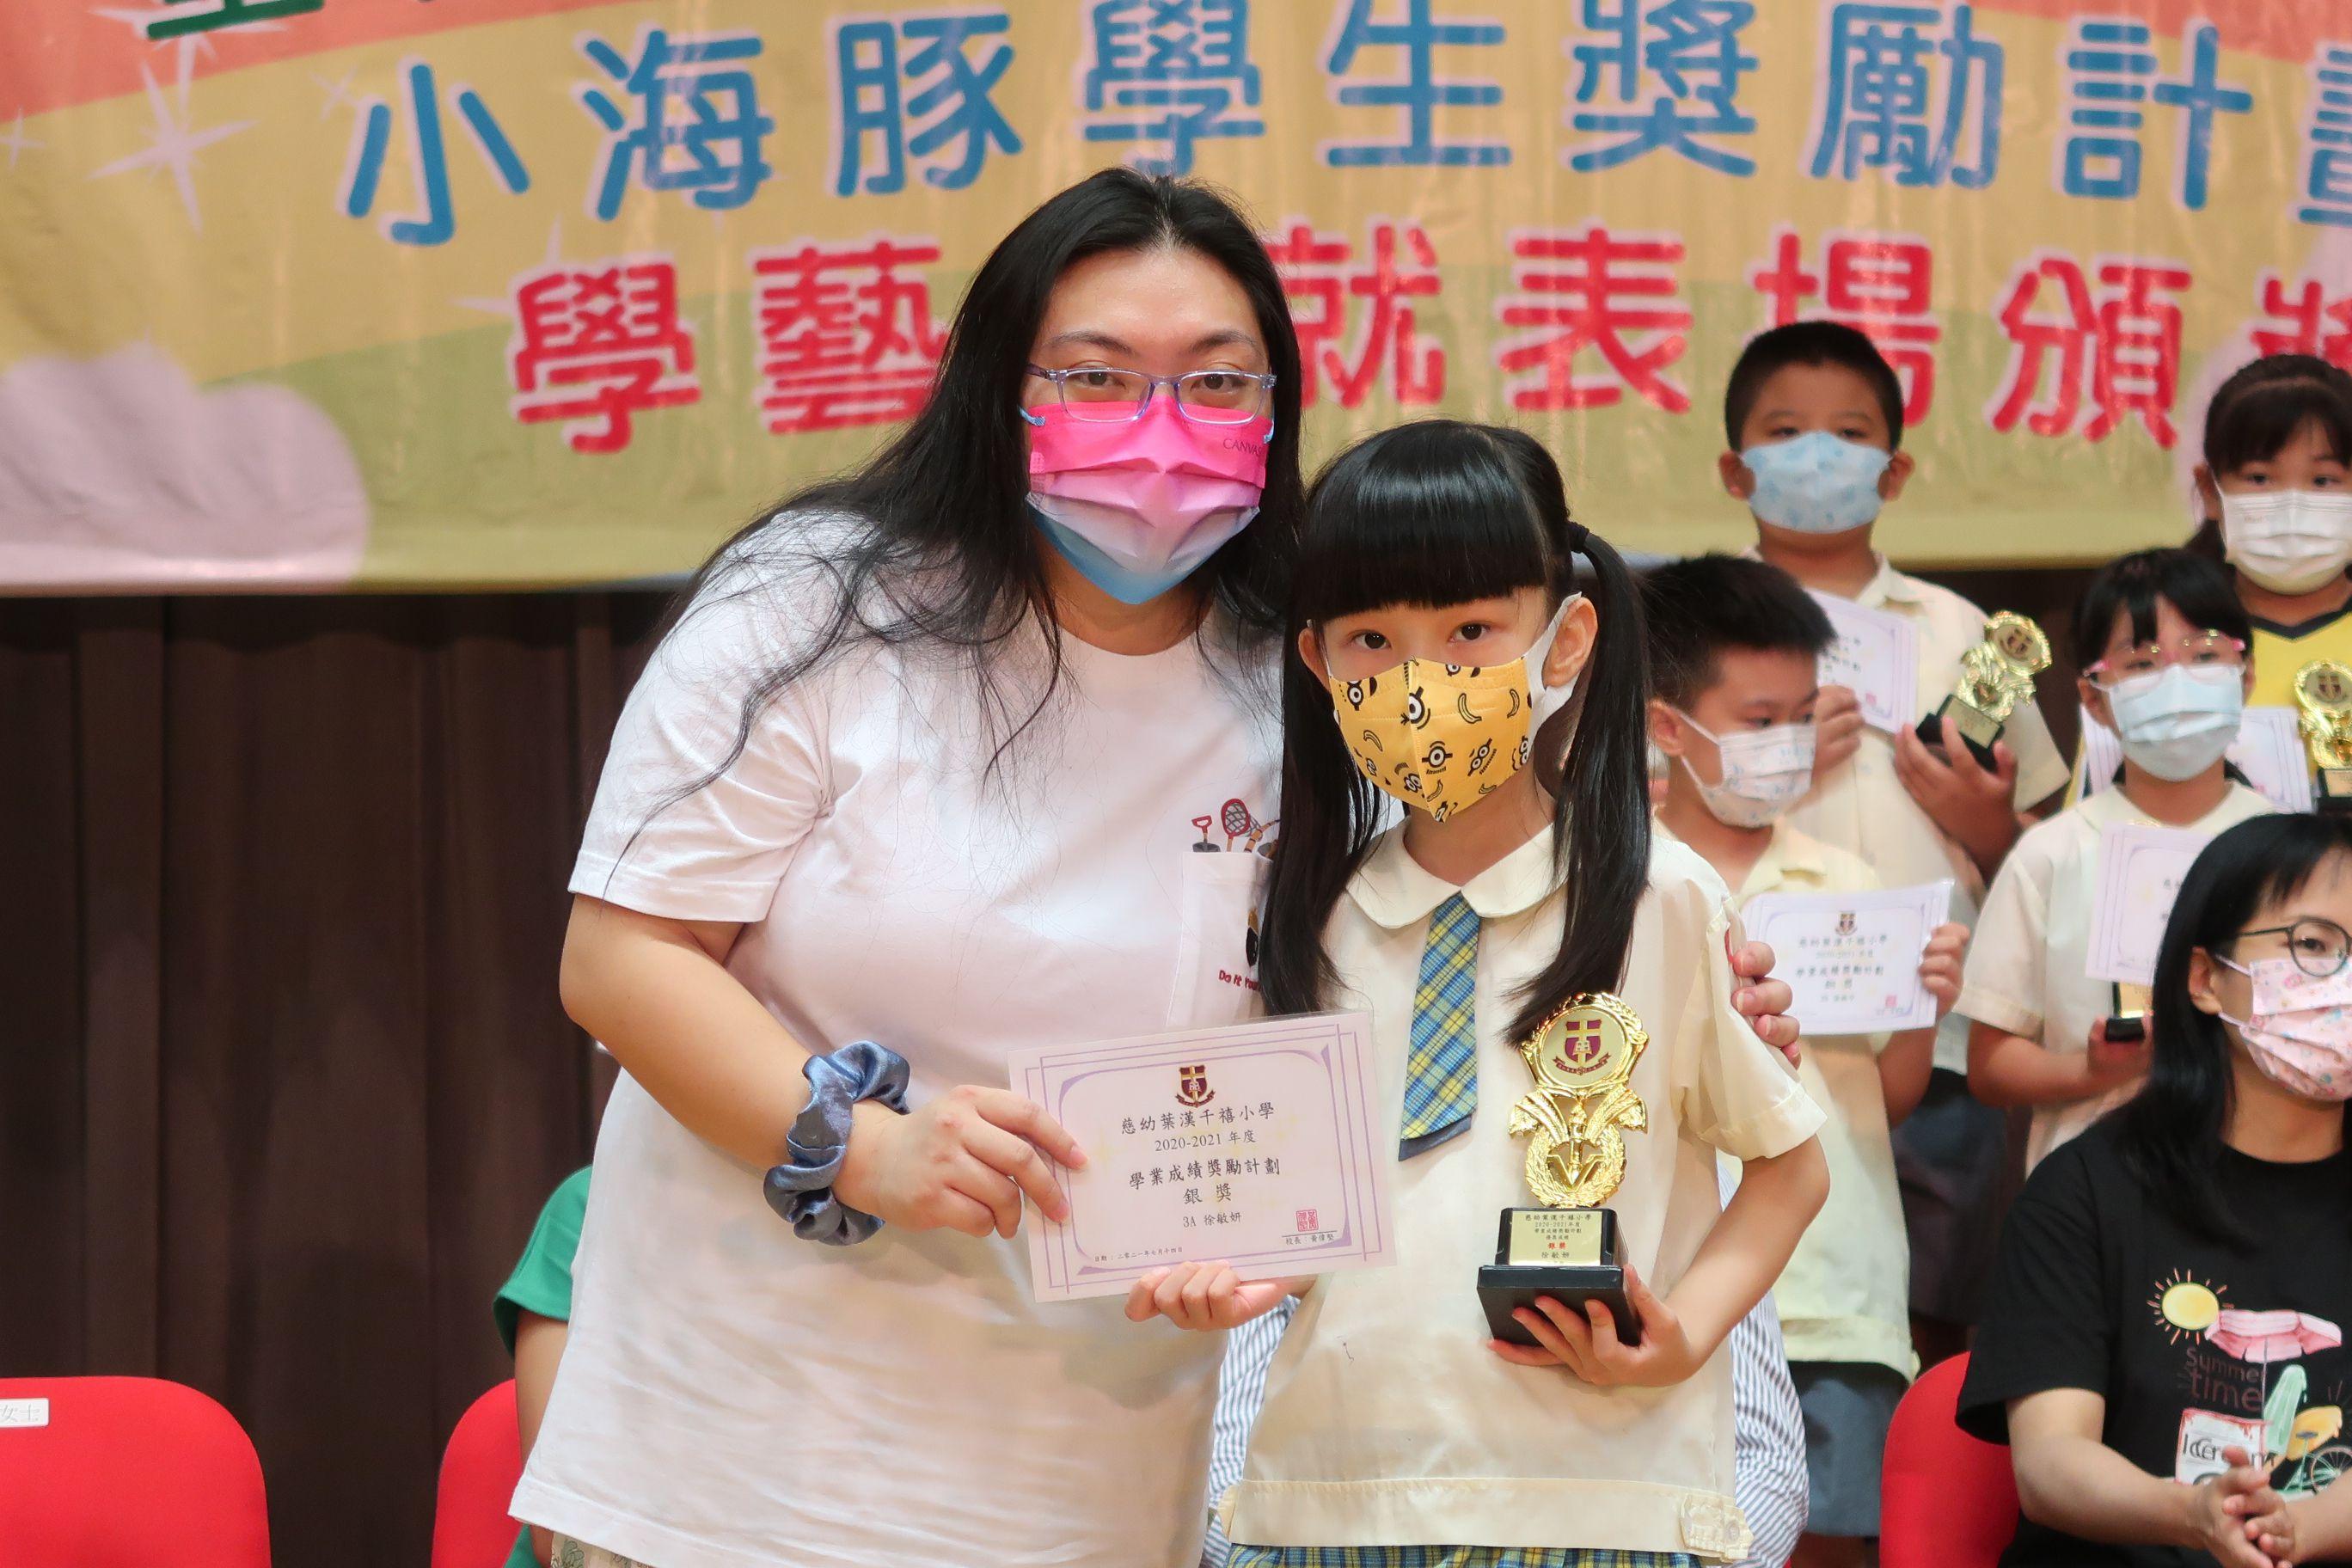 https://syh.edu.hk/sites/default/files/img_5585.jpg